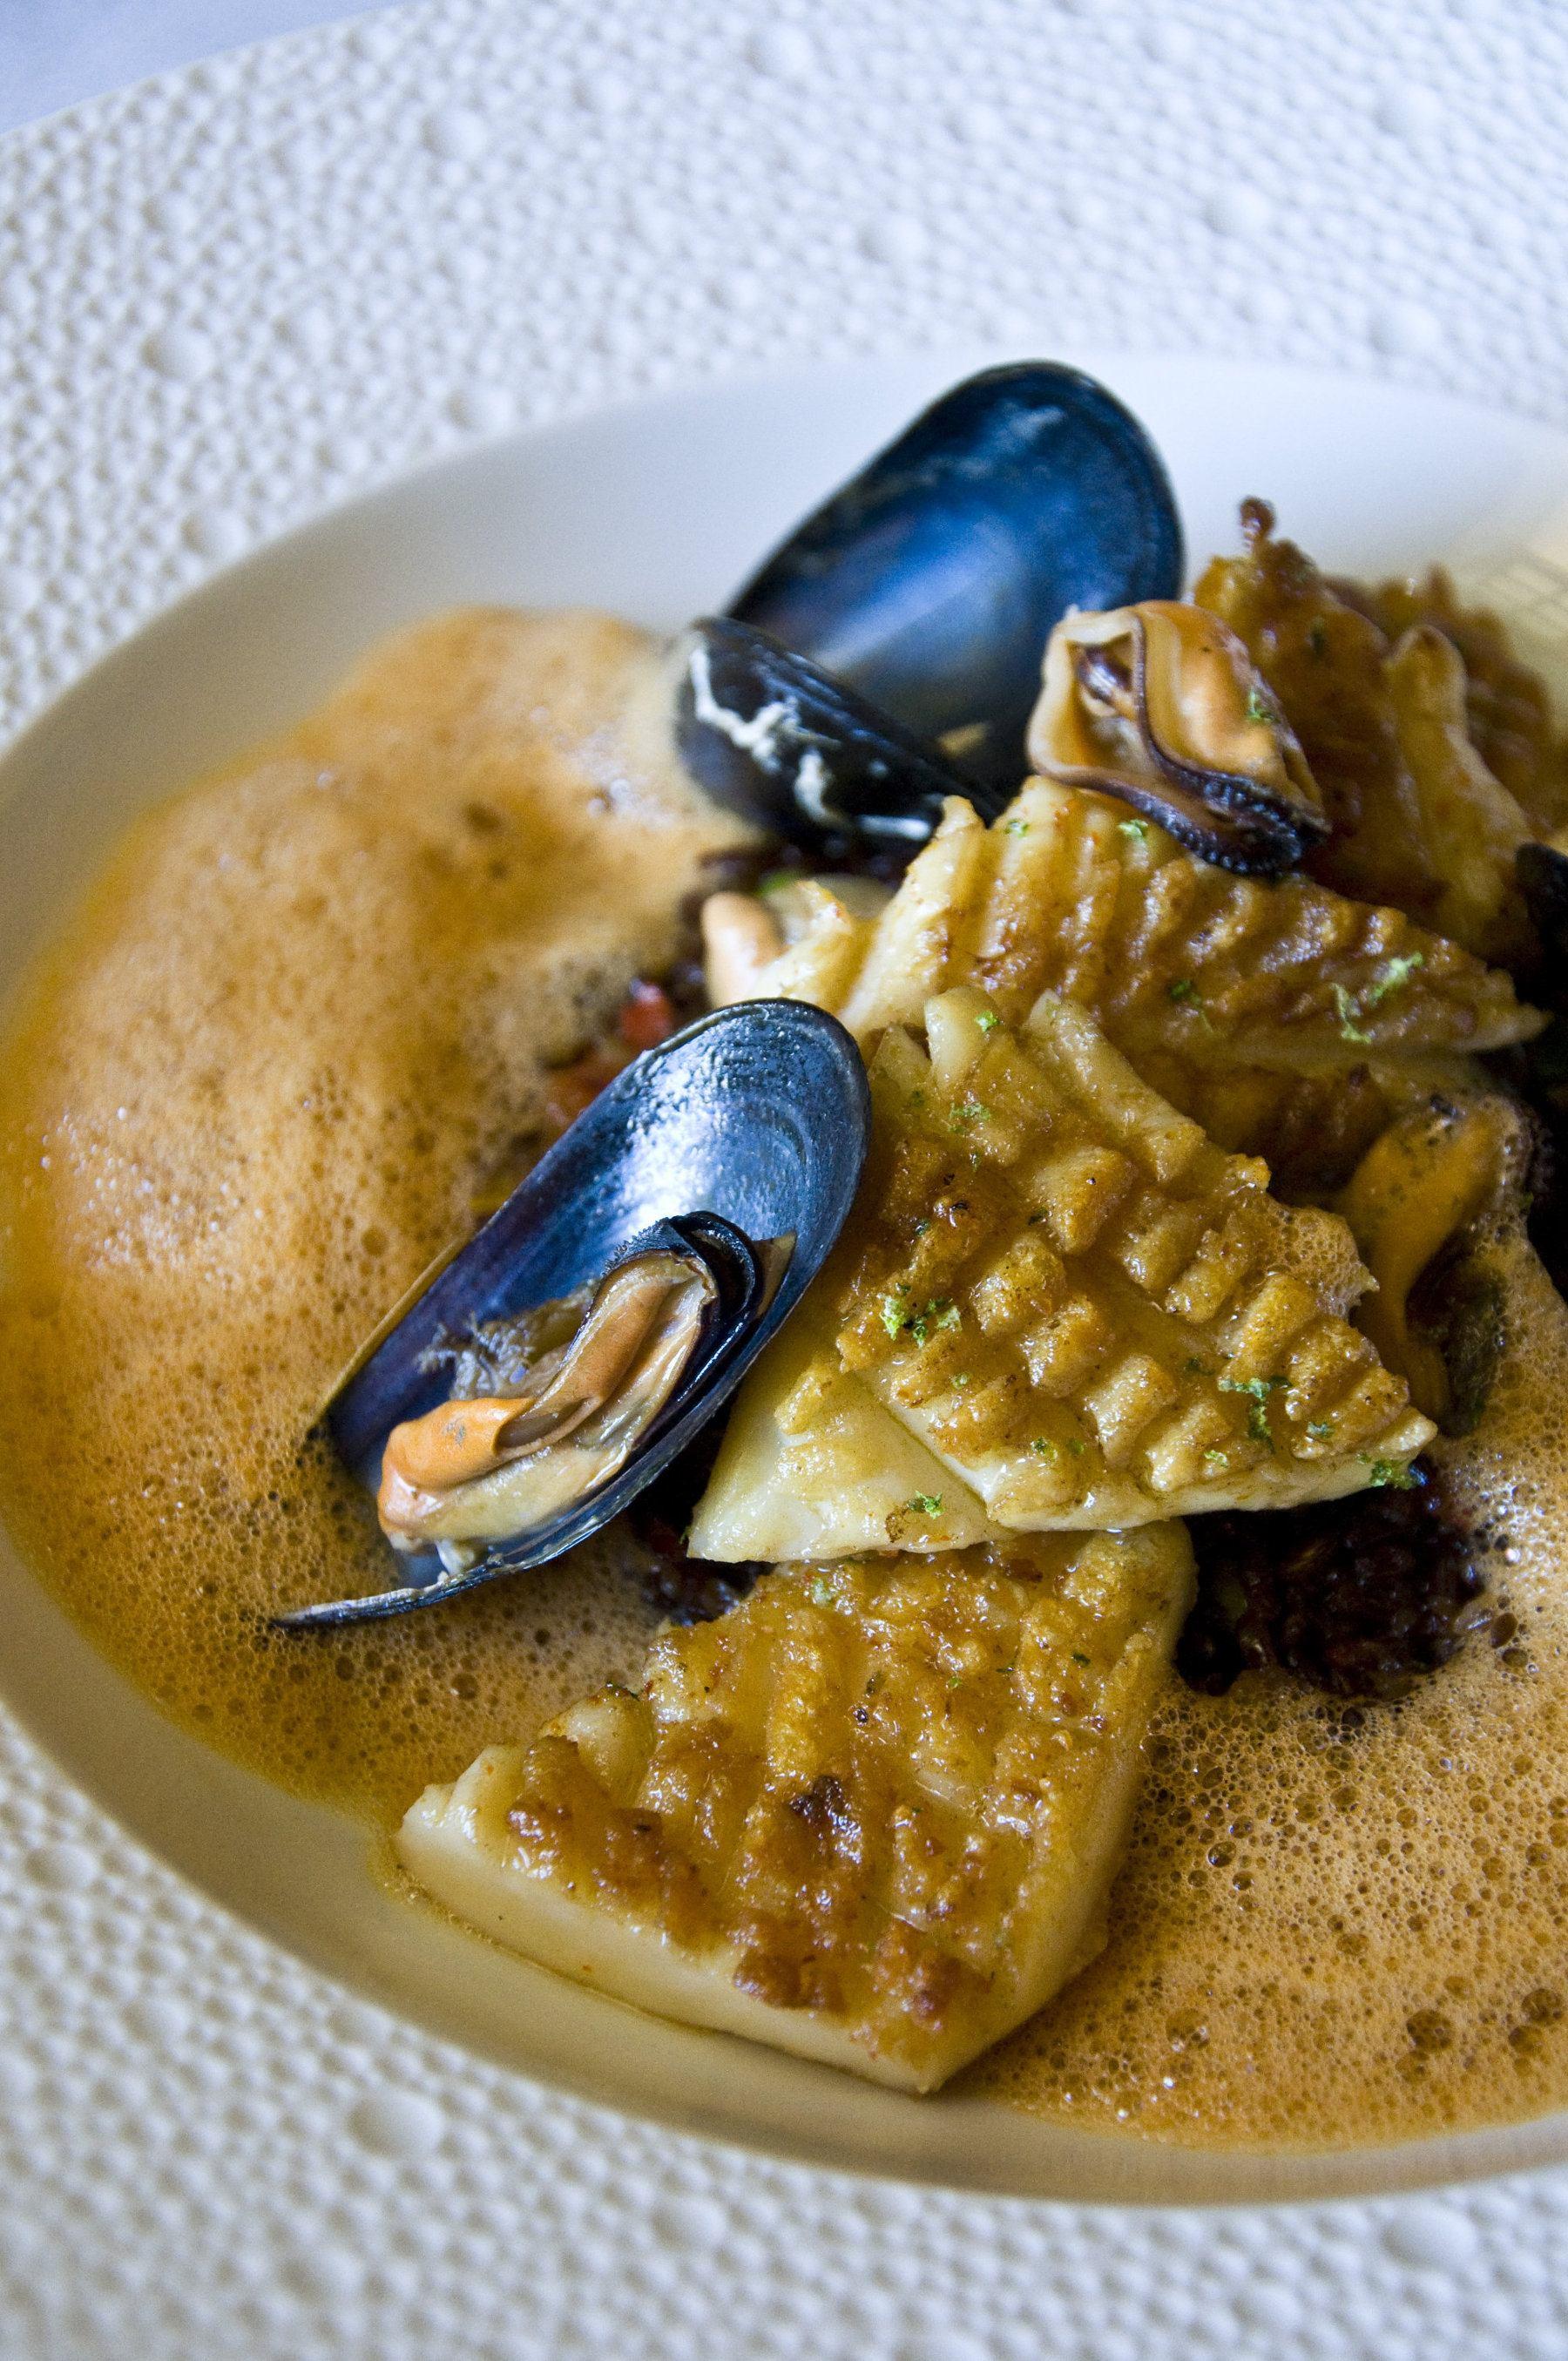 InterContinental-Marseille-Hotel-Dieu-Gros-calamars-cuisines-comme-une-paella-riz-de-Camargue